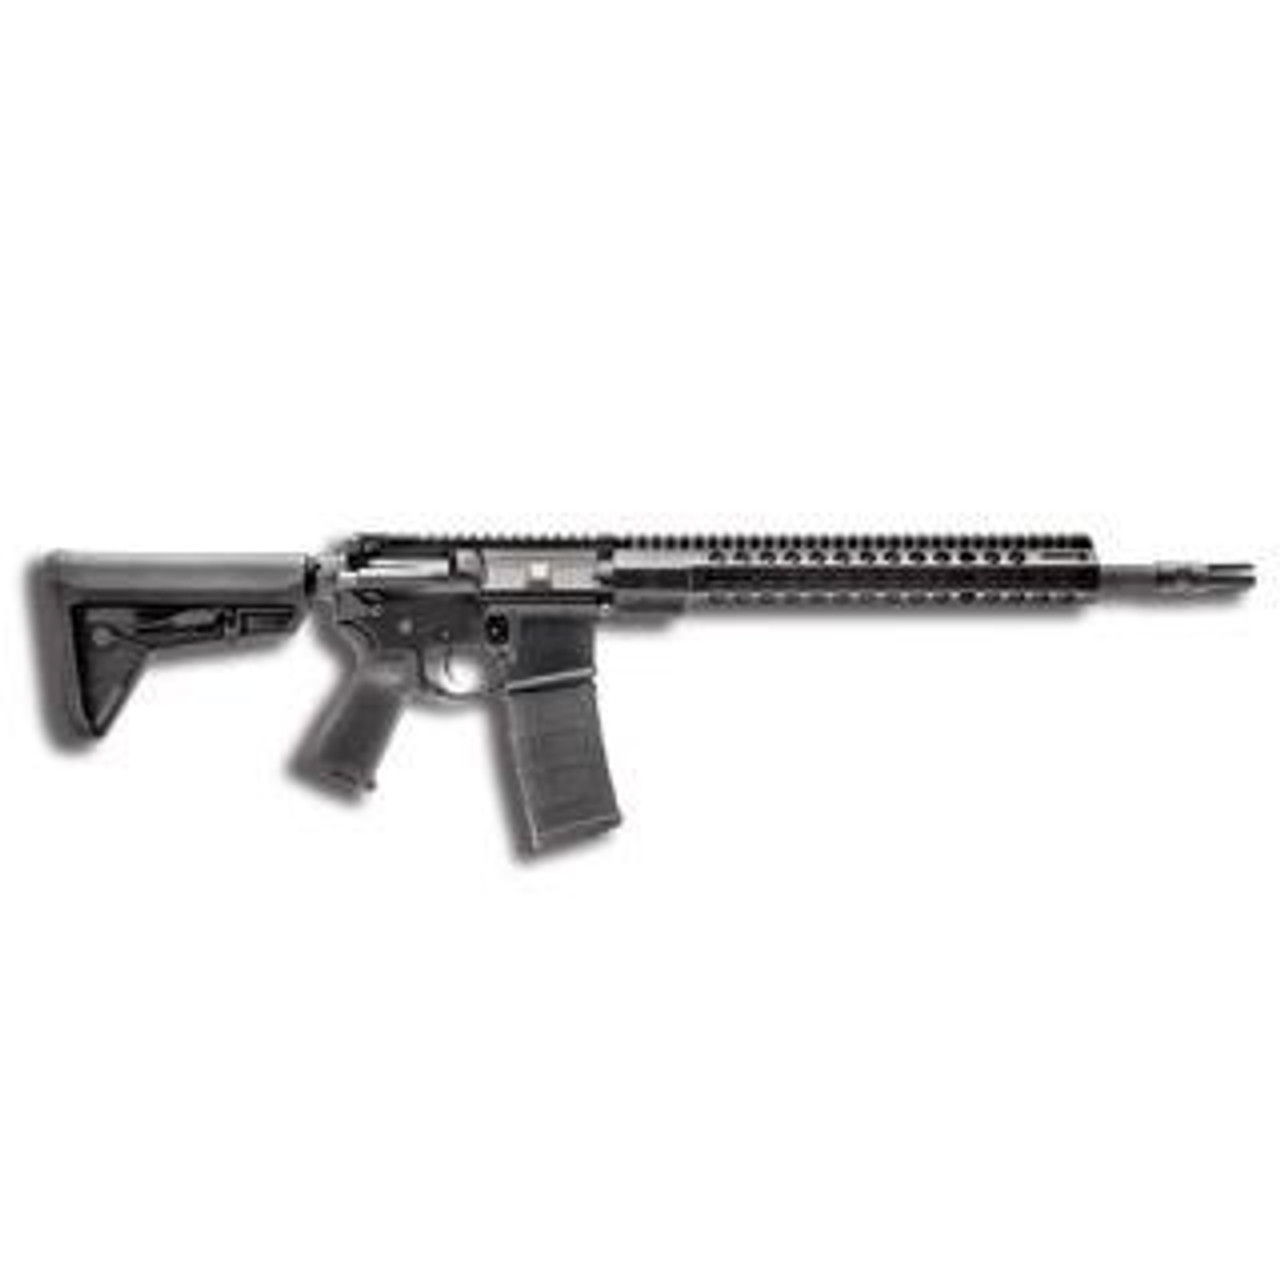 FNH FN15 Tactical II Carbine CALIFORNIA LEGAL - .223/5.56